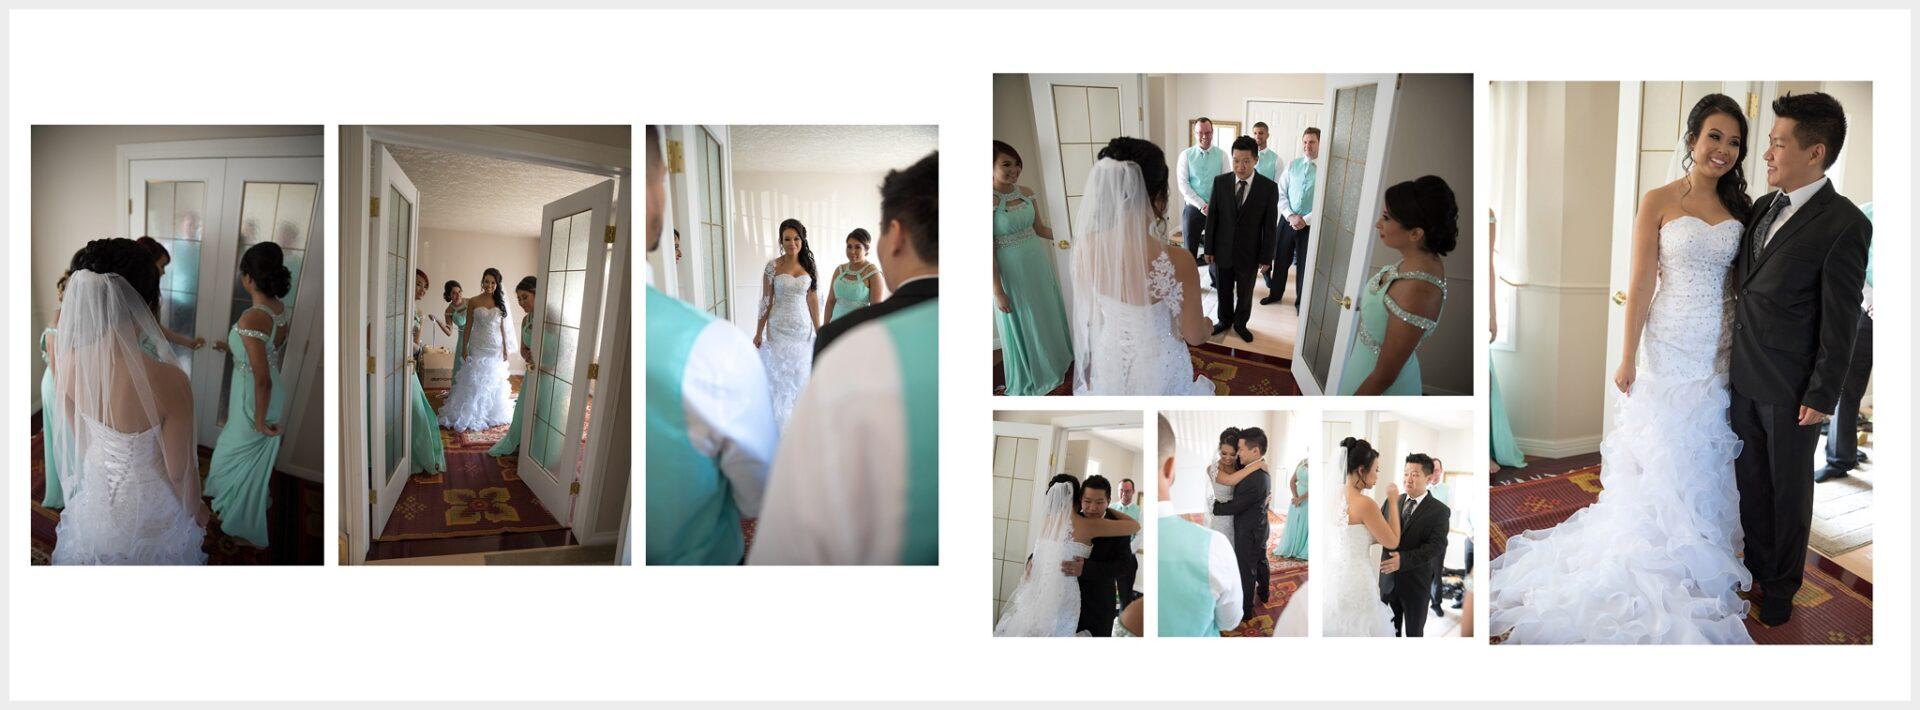 Cambodian Wedding Edmonton Calgary Photo Album-_0003